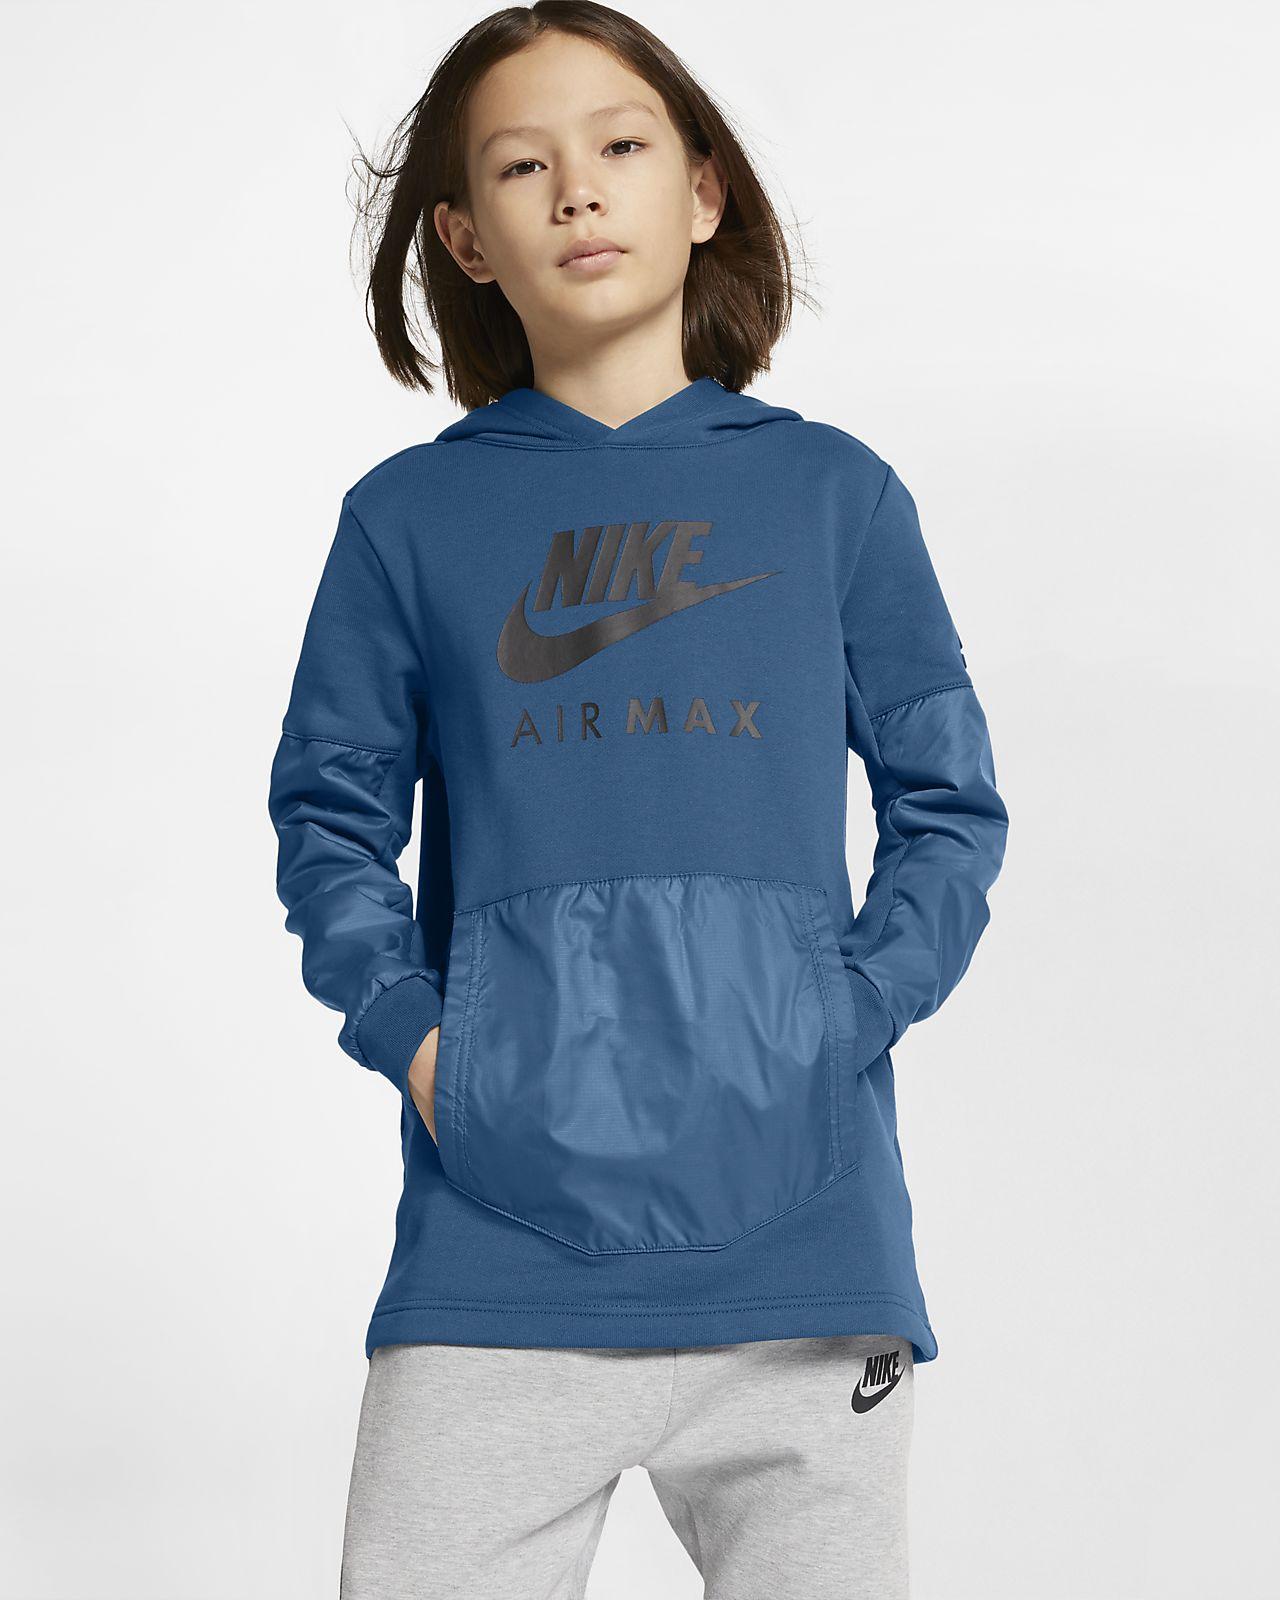 6b872ce783e Μπλούζα με κουκούλα Nike Air Max για μεγάλα αγόρια. Nike.com GR